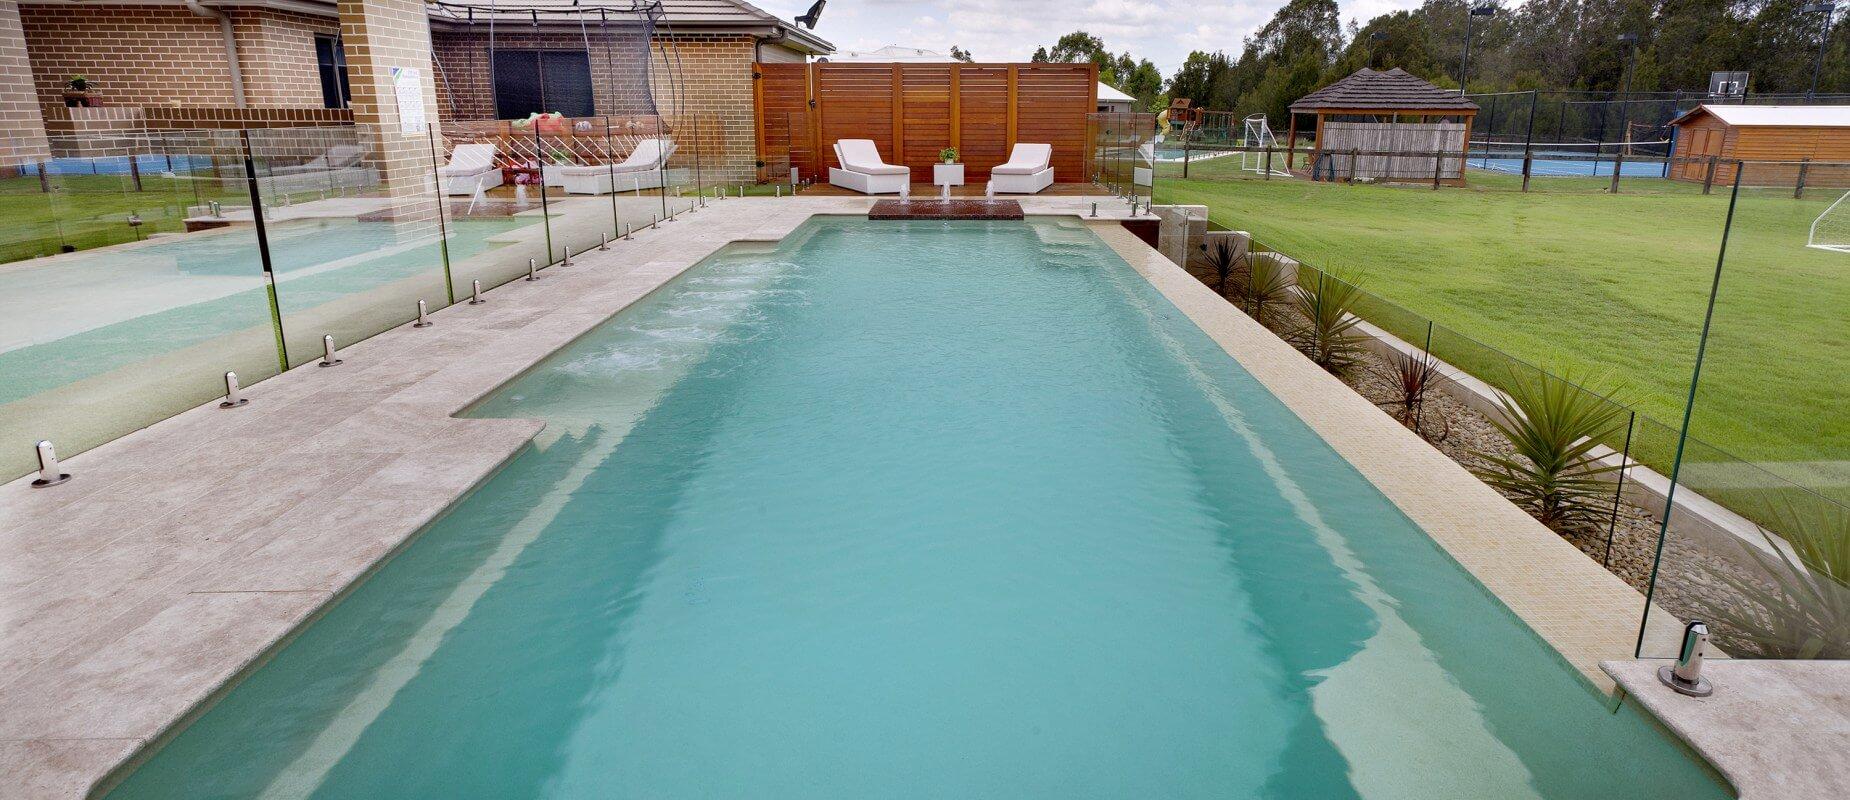 piscina de lux modele frumoase 29